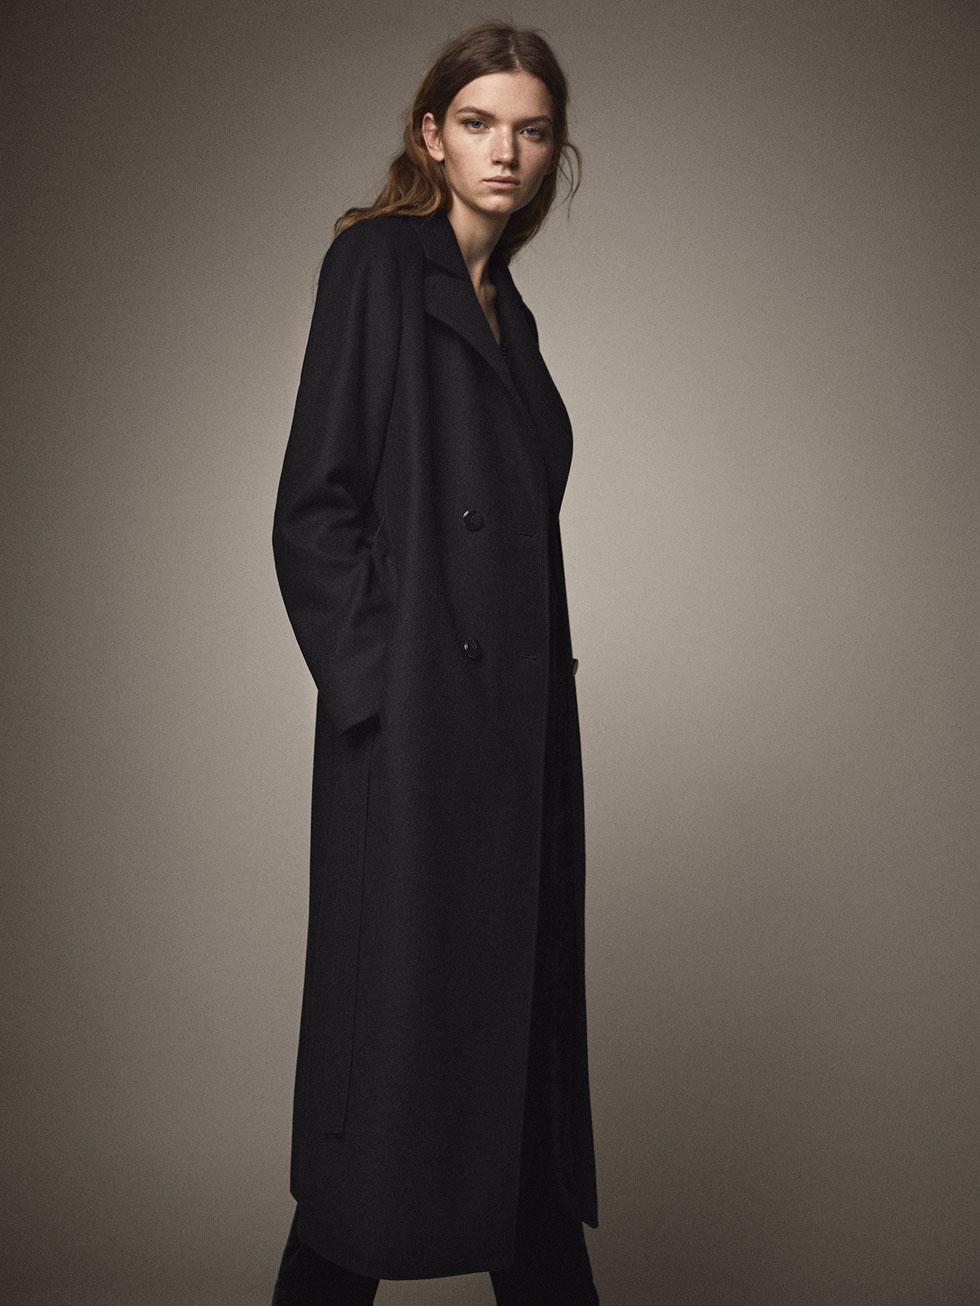 WOOL COAT WITH BELT DETAIL - Women - Massimo Dutti